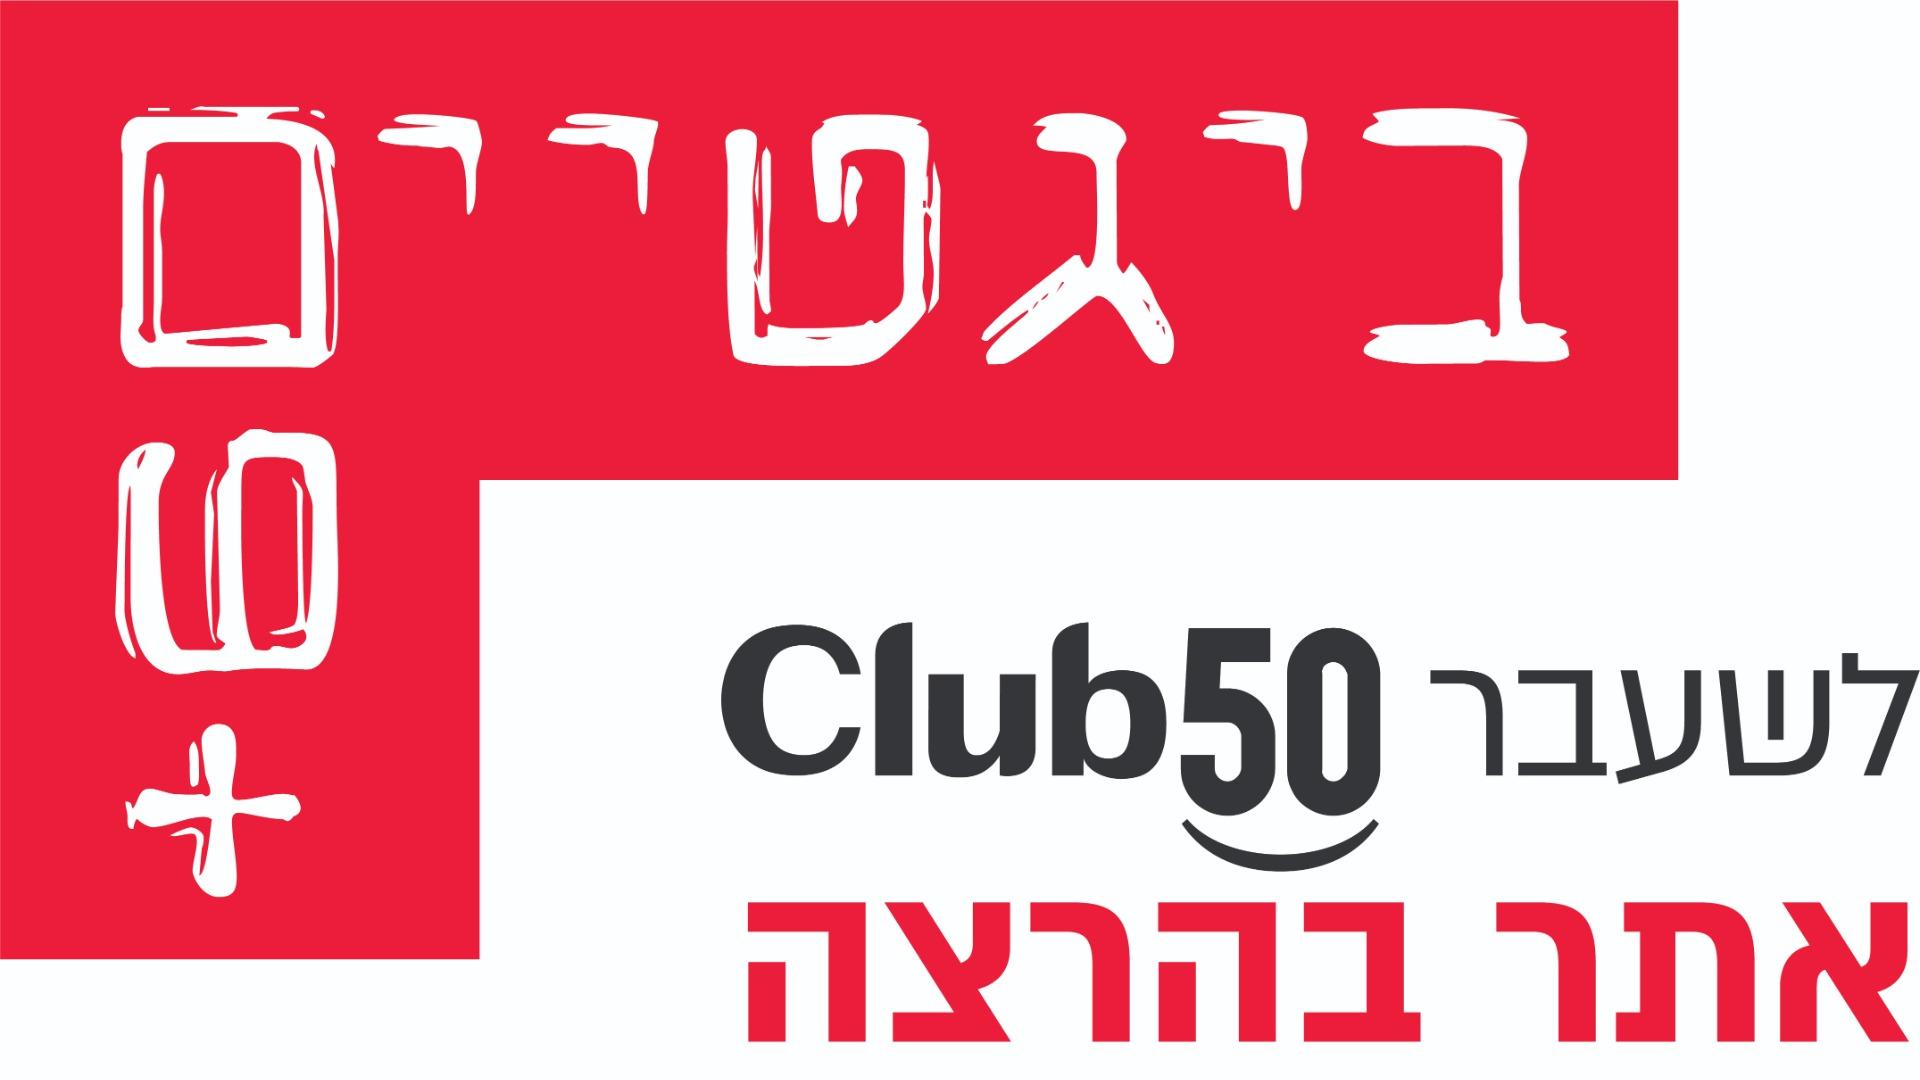 bigtime-60-logo-copy@2x.png